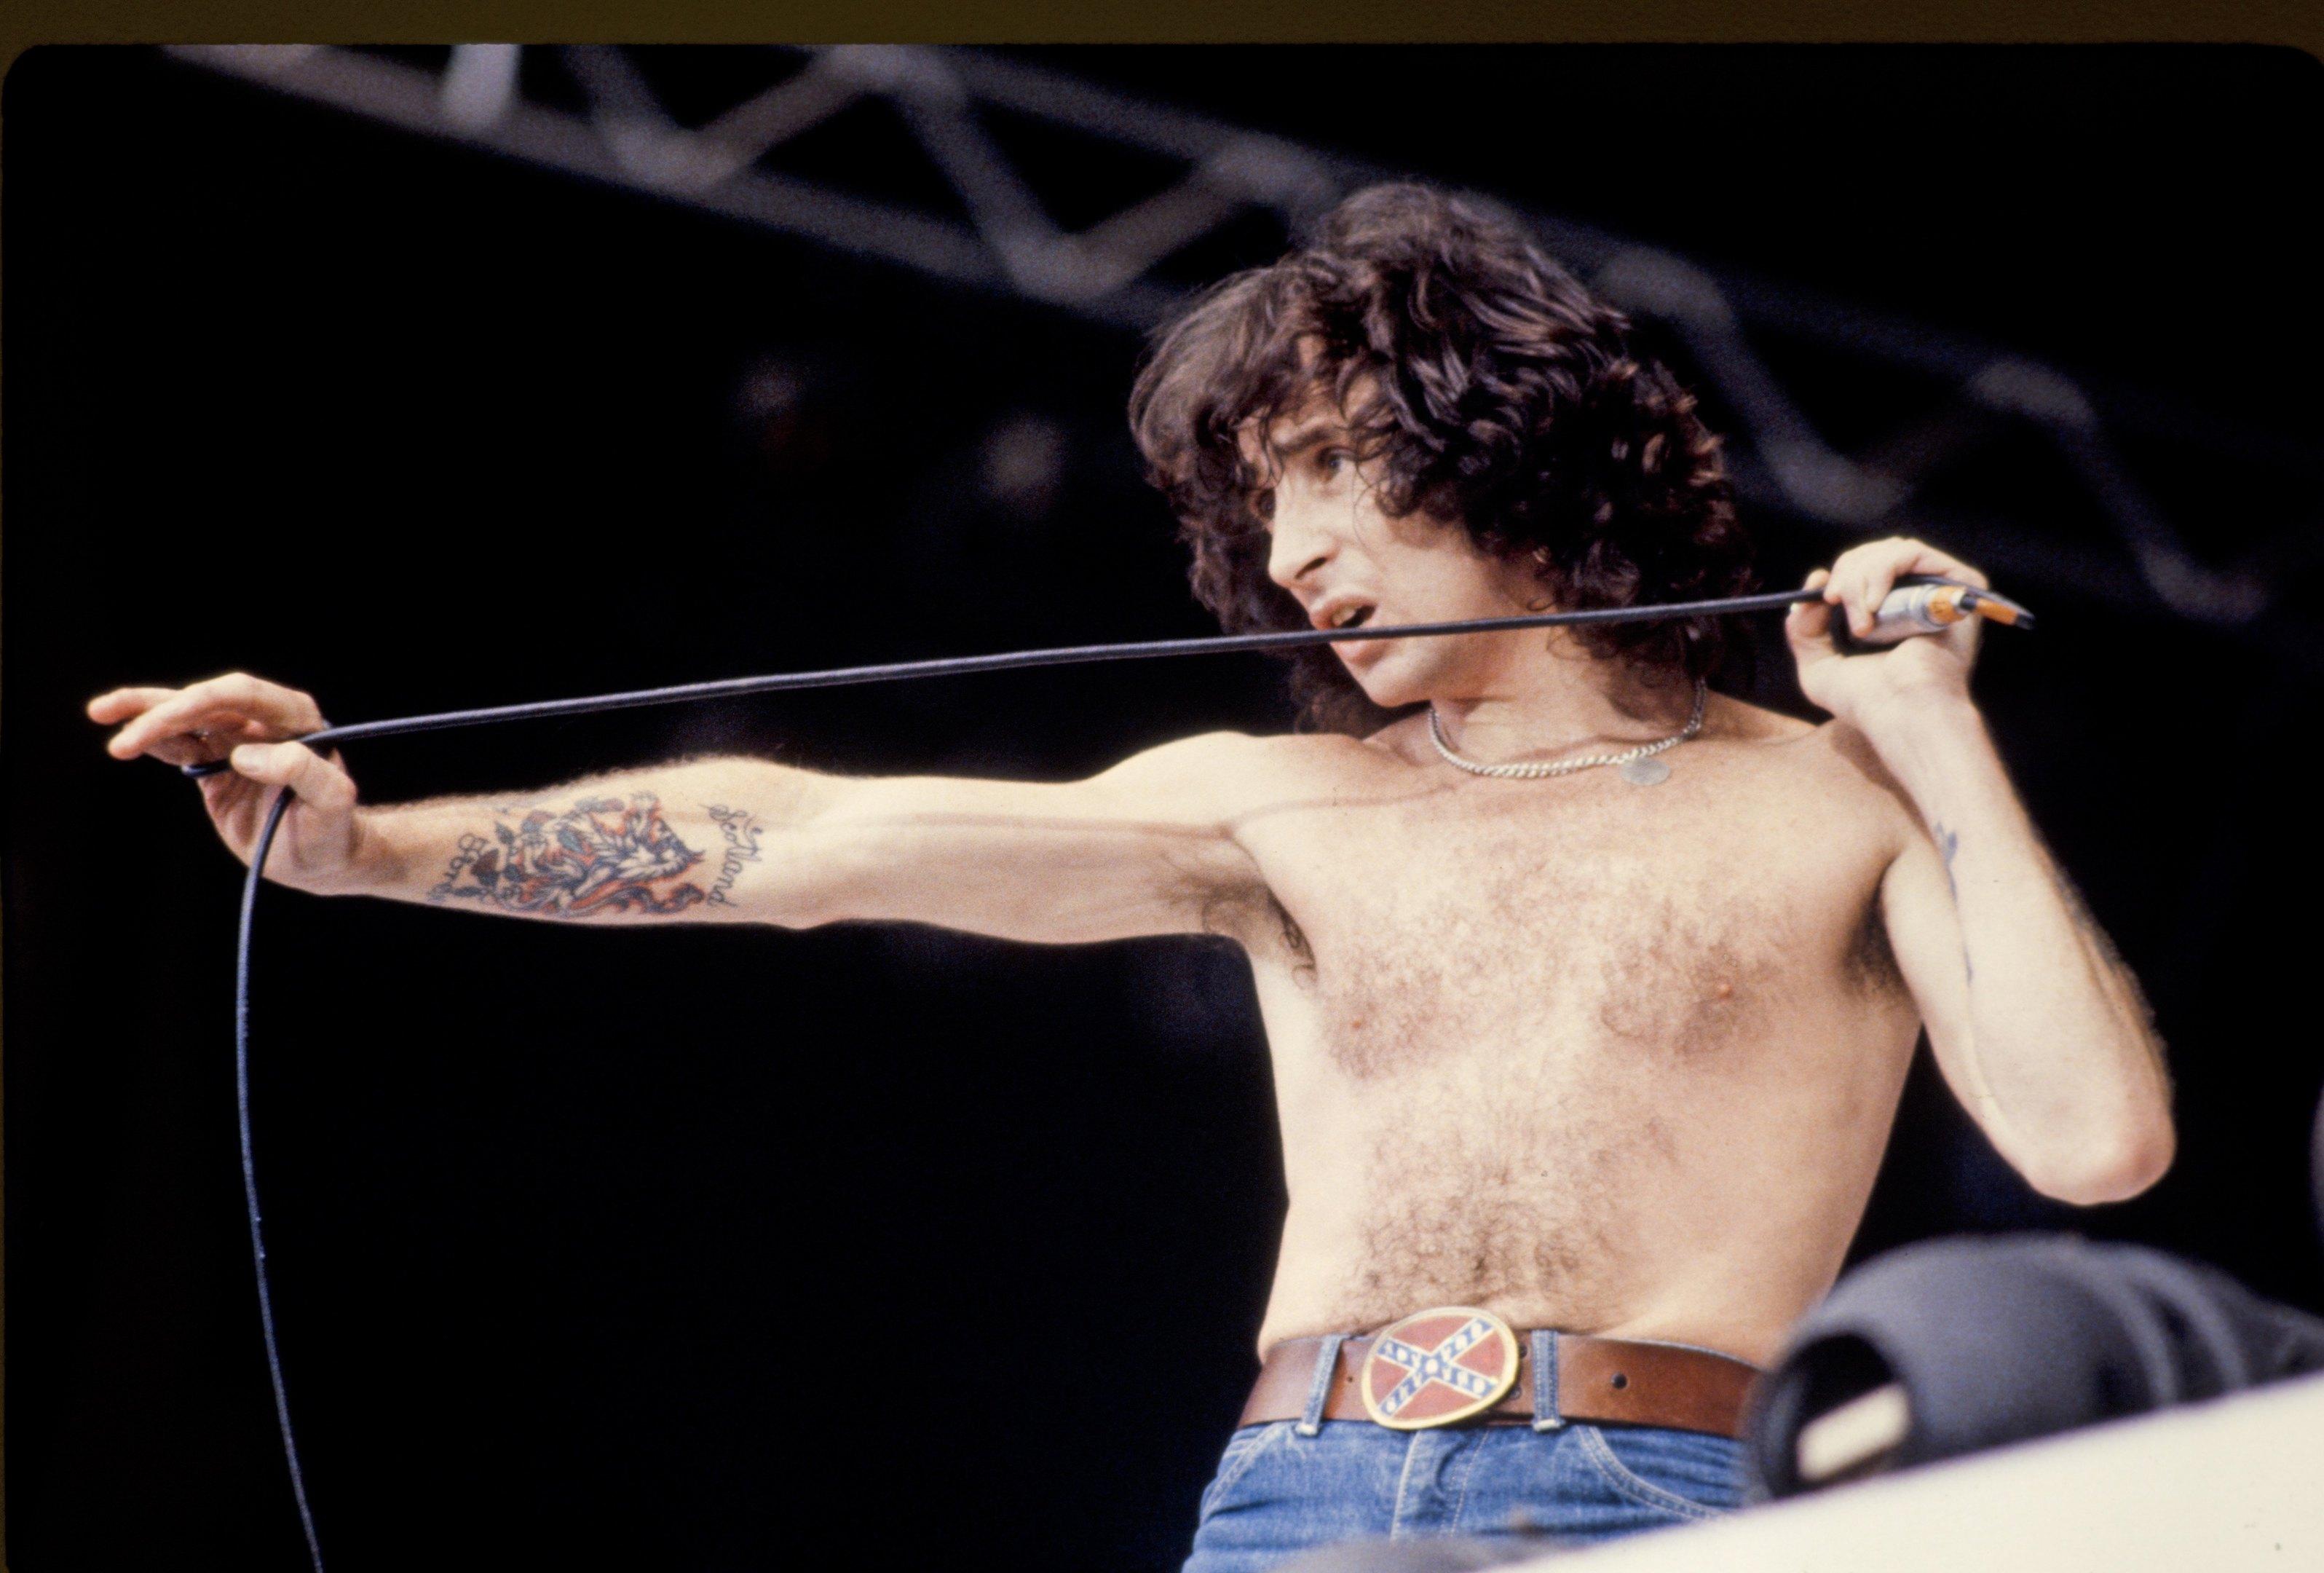 Bon Scott performs at Wembley Stadium on August 18, 1979 (FG/Bauer-Griffin/Getty Images)